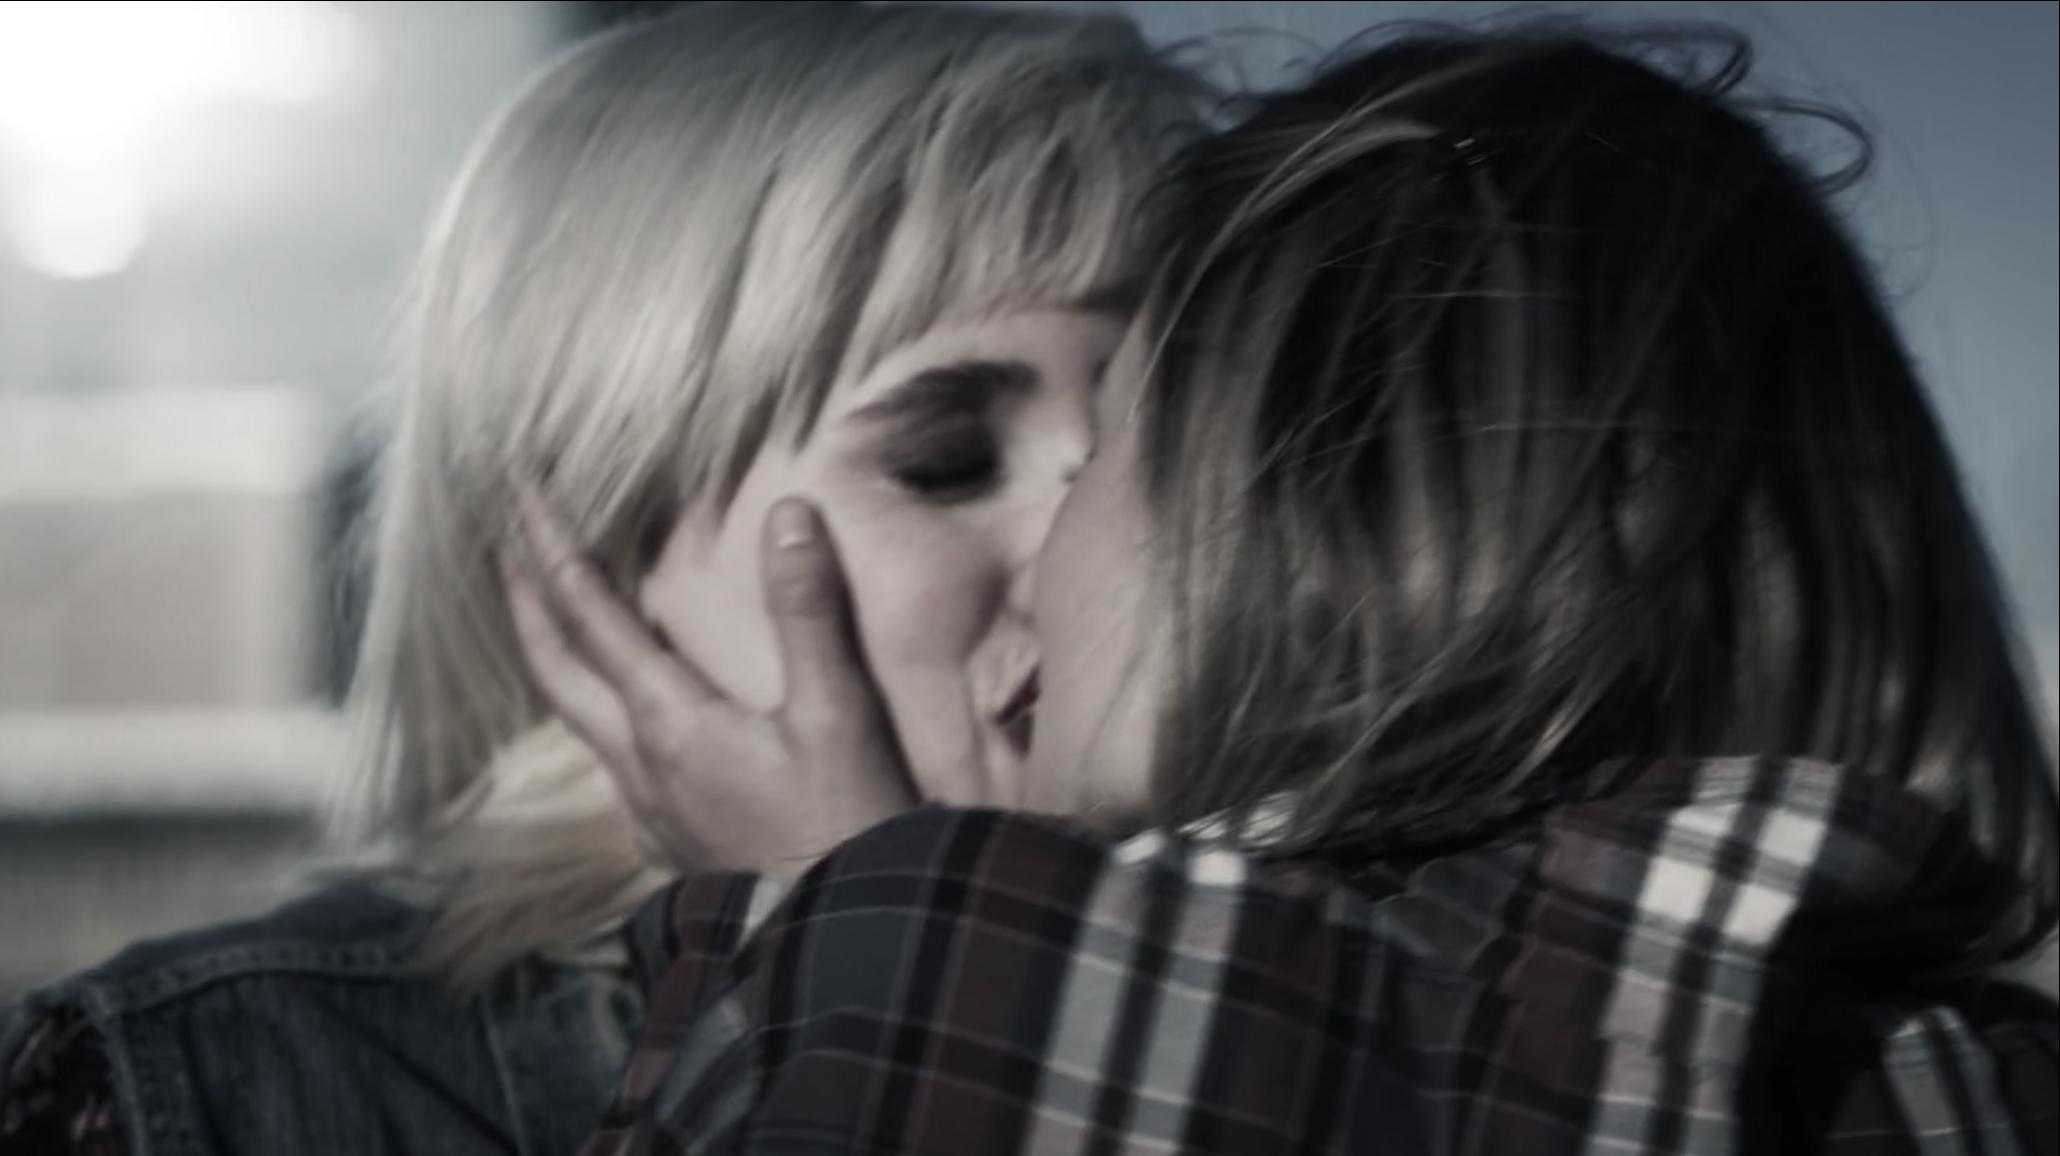 Kate and Mallory kissing